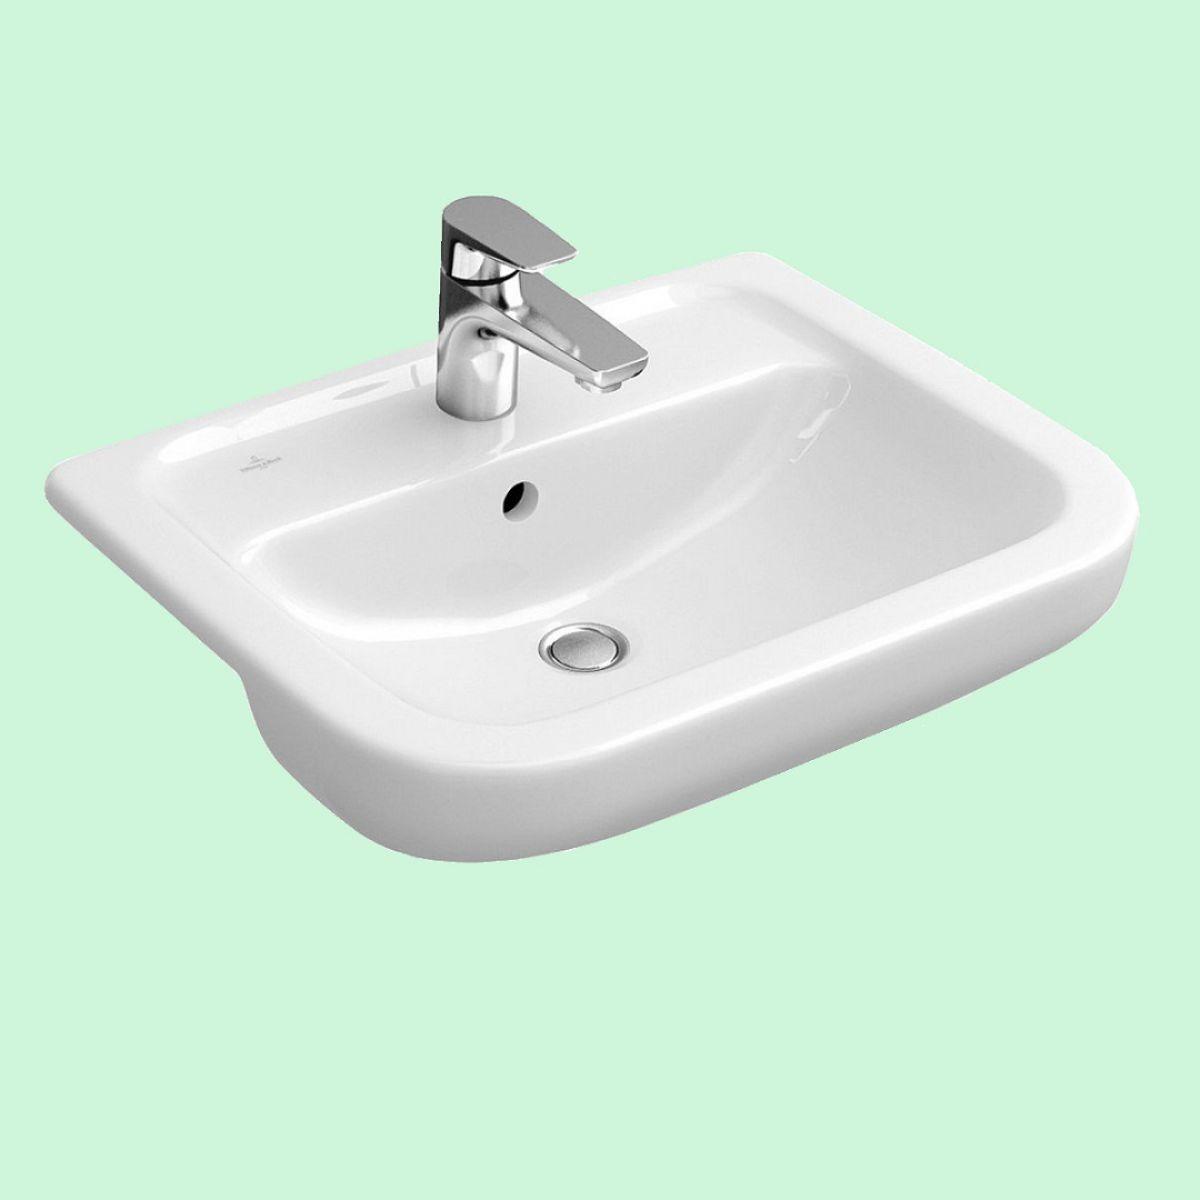 villeroy boch soho subway semi countertop basin uk. Black Bedroom Furniture Sets. Home Design Ideas